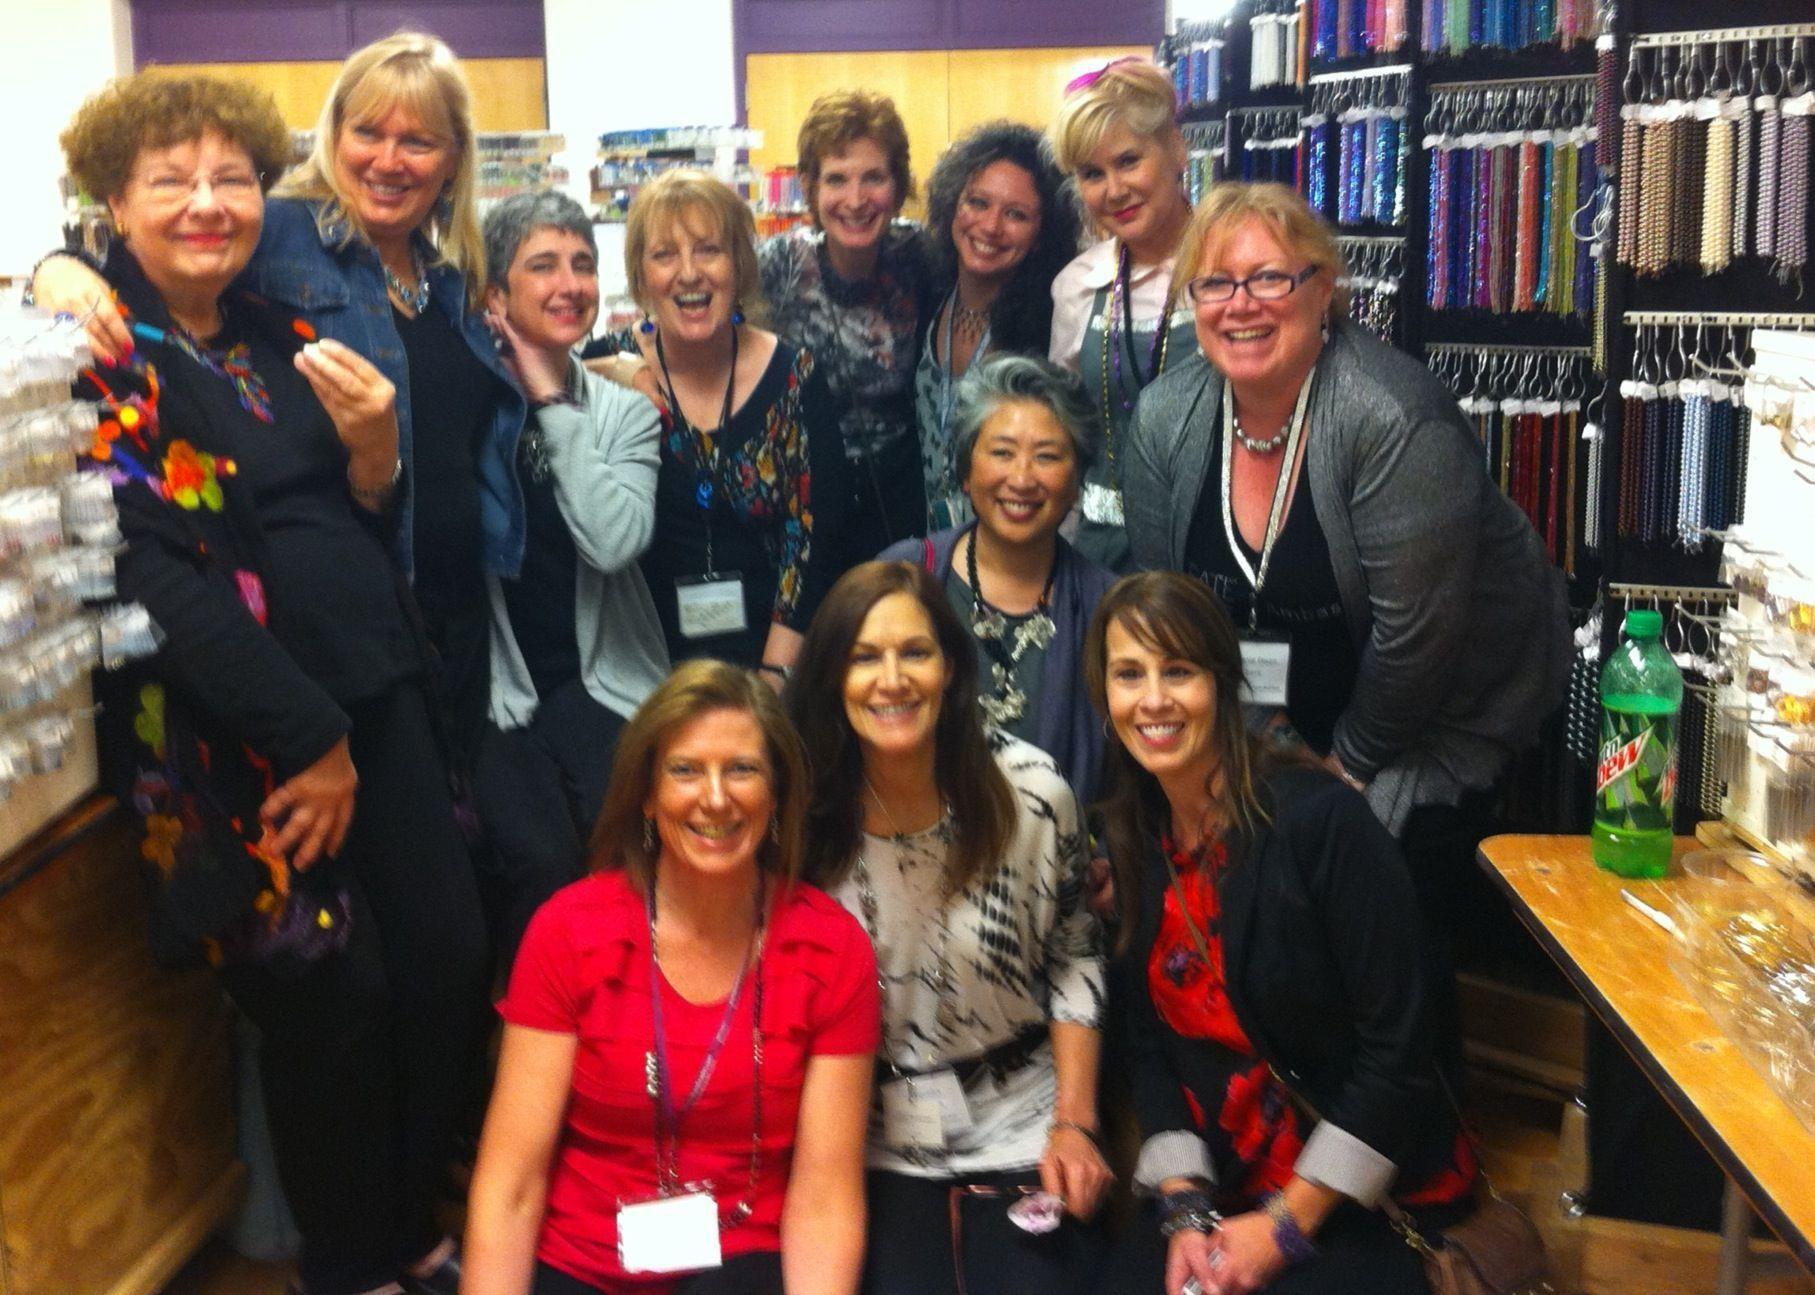 Swarovski Ambassadors (and proud editor) at book signing at Beyond Beadery in Tucson, AZ!